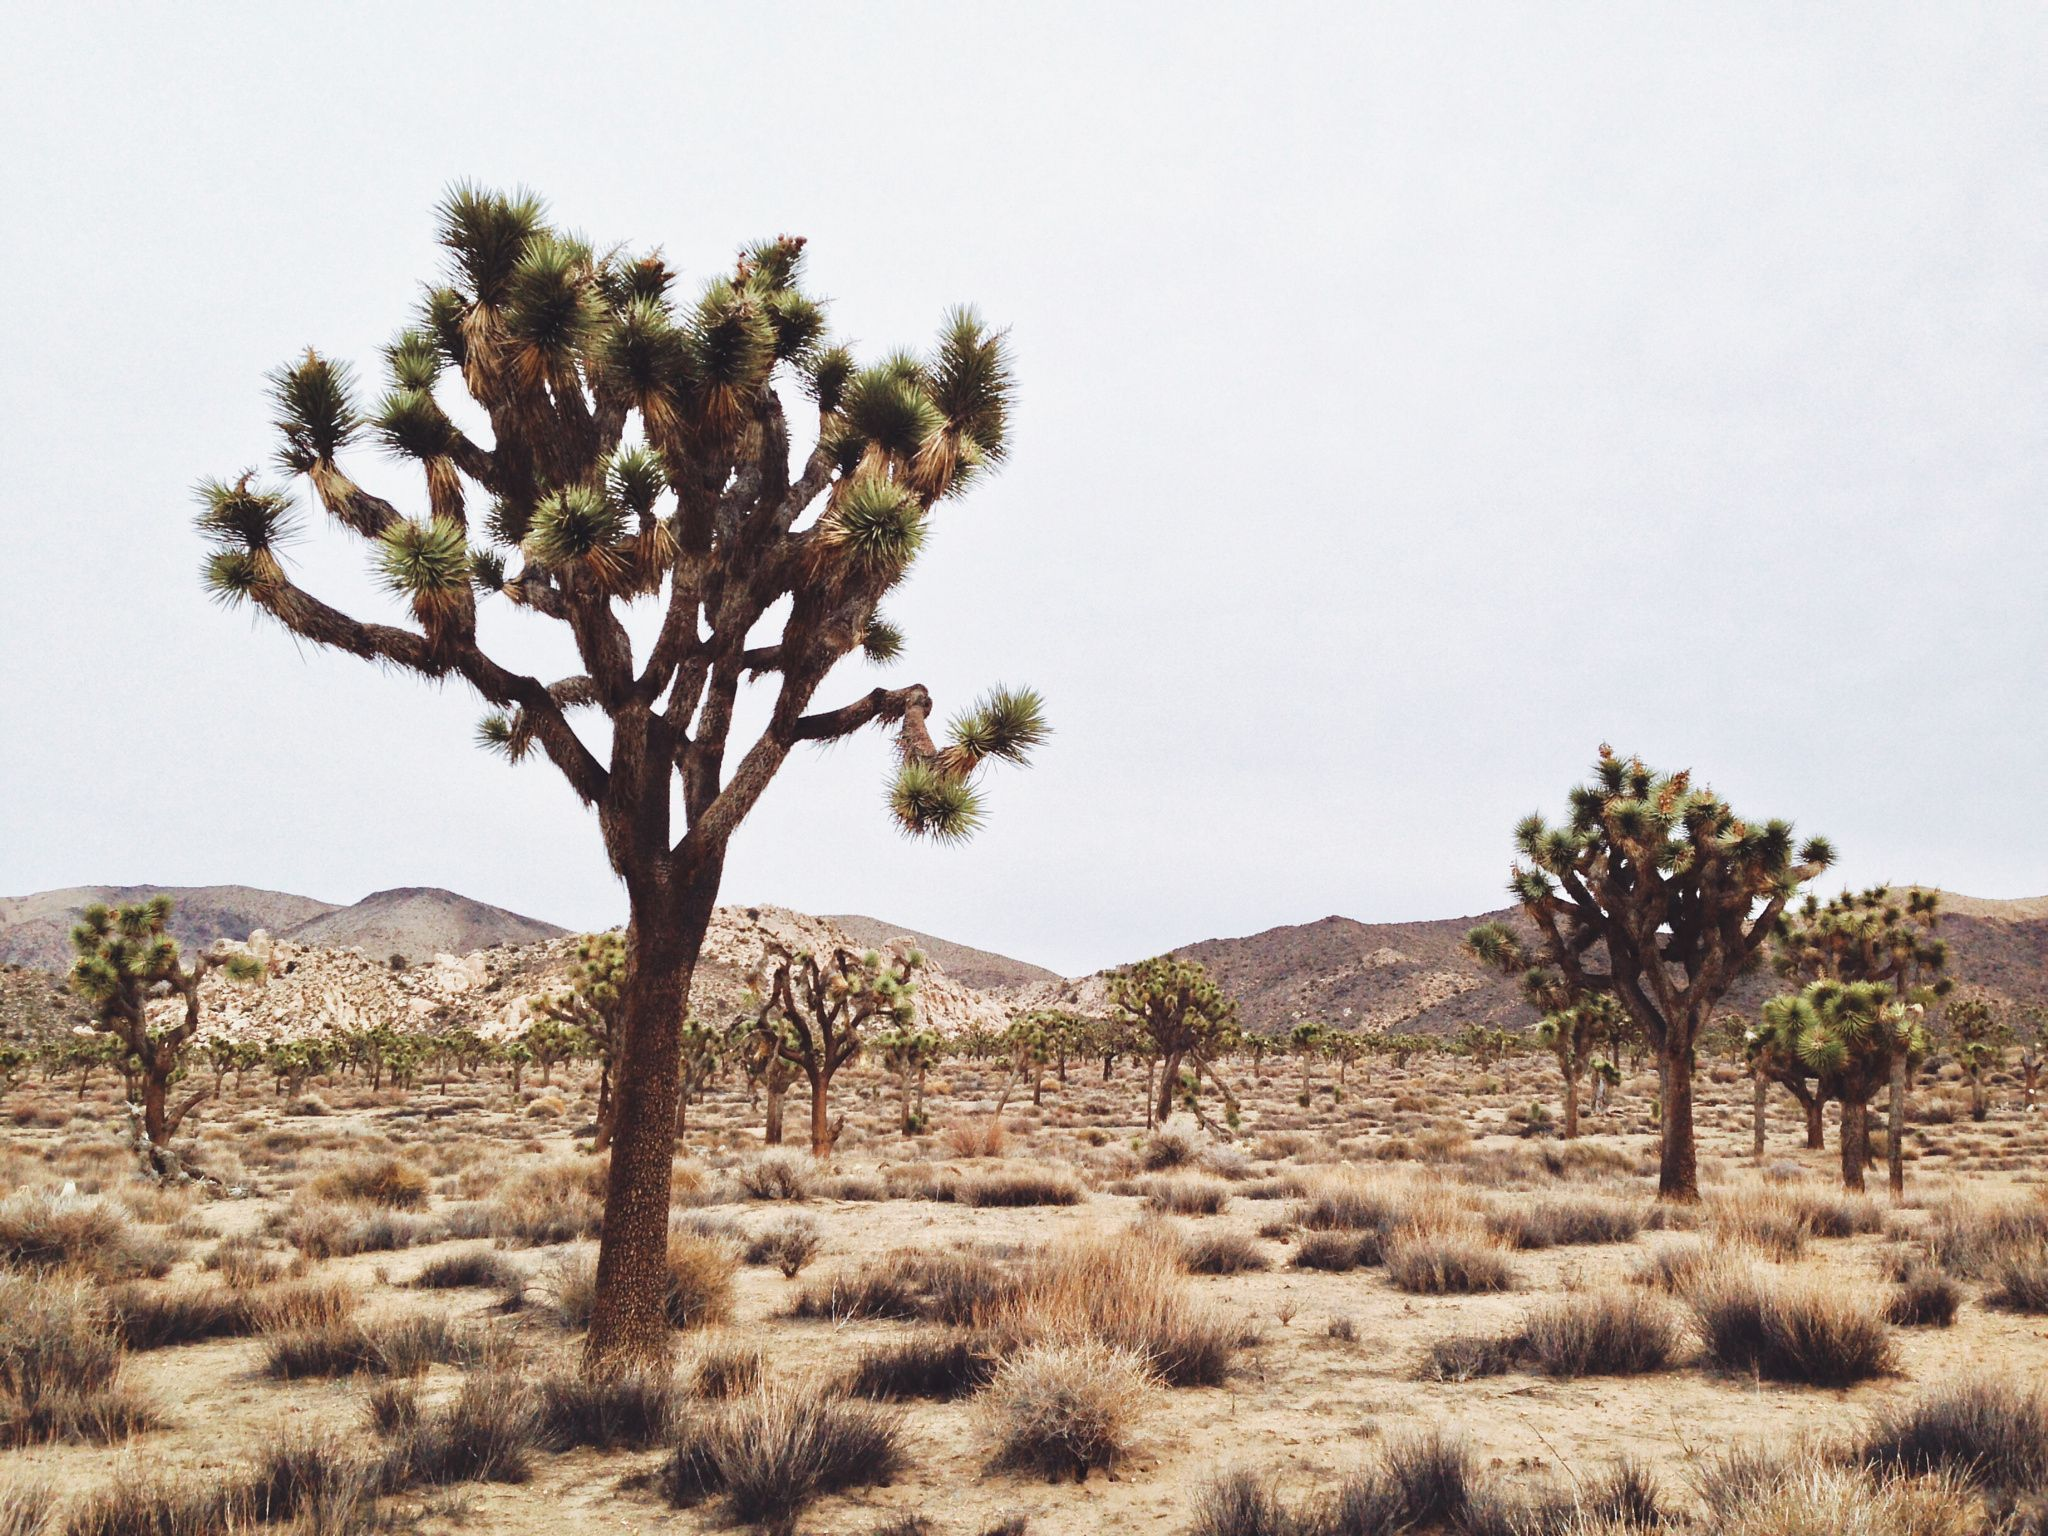 Joshua Trees - Joshua Trees